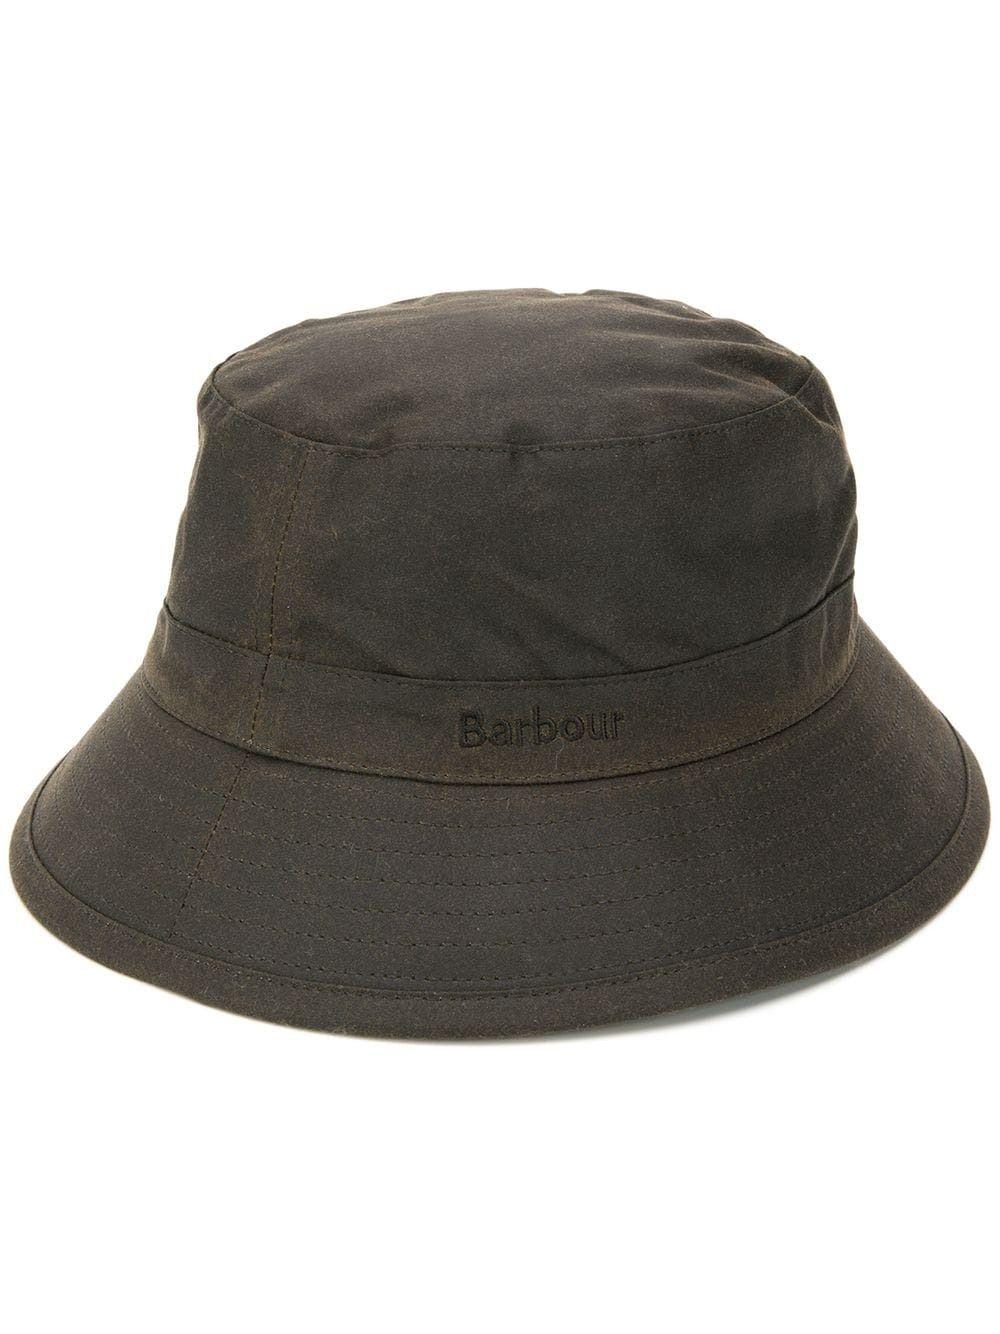 cappello bucket uomo olive in cotone BARBOUR | Cappelli | MHA0001OL71